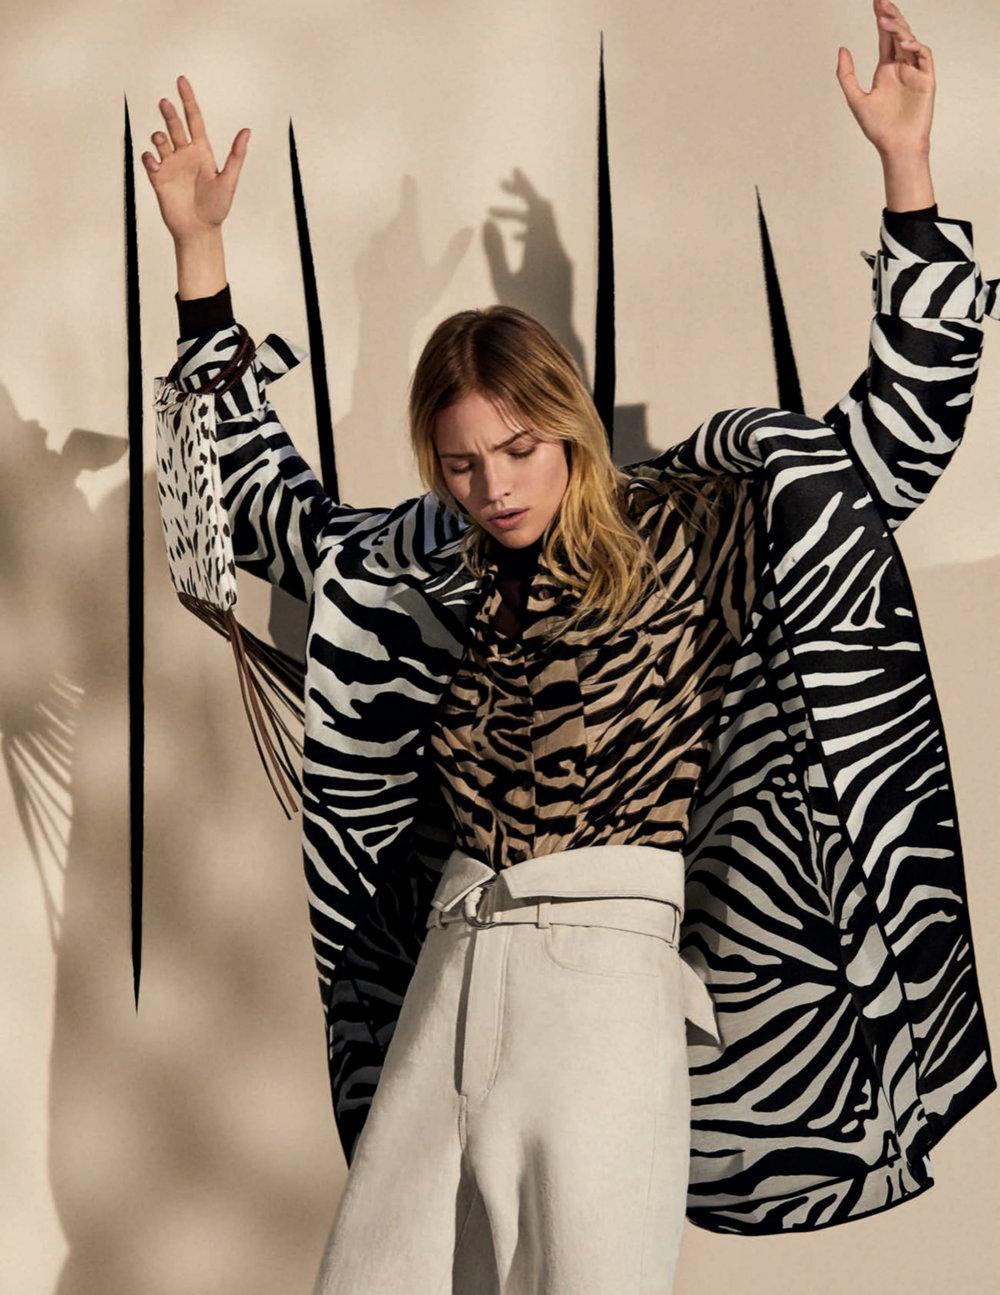 Sasha Luss by Gorka Postigo for Vogue Spain March 2019 (1).jpg